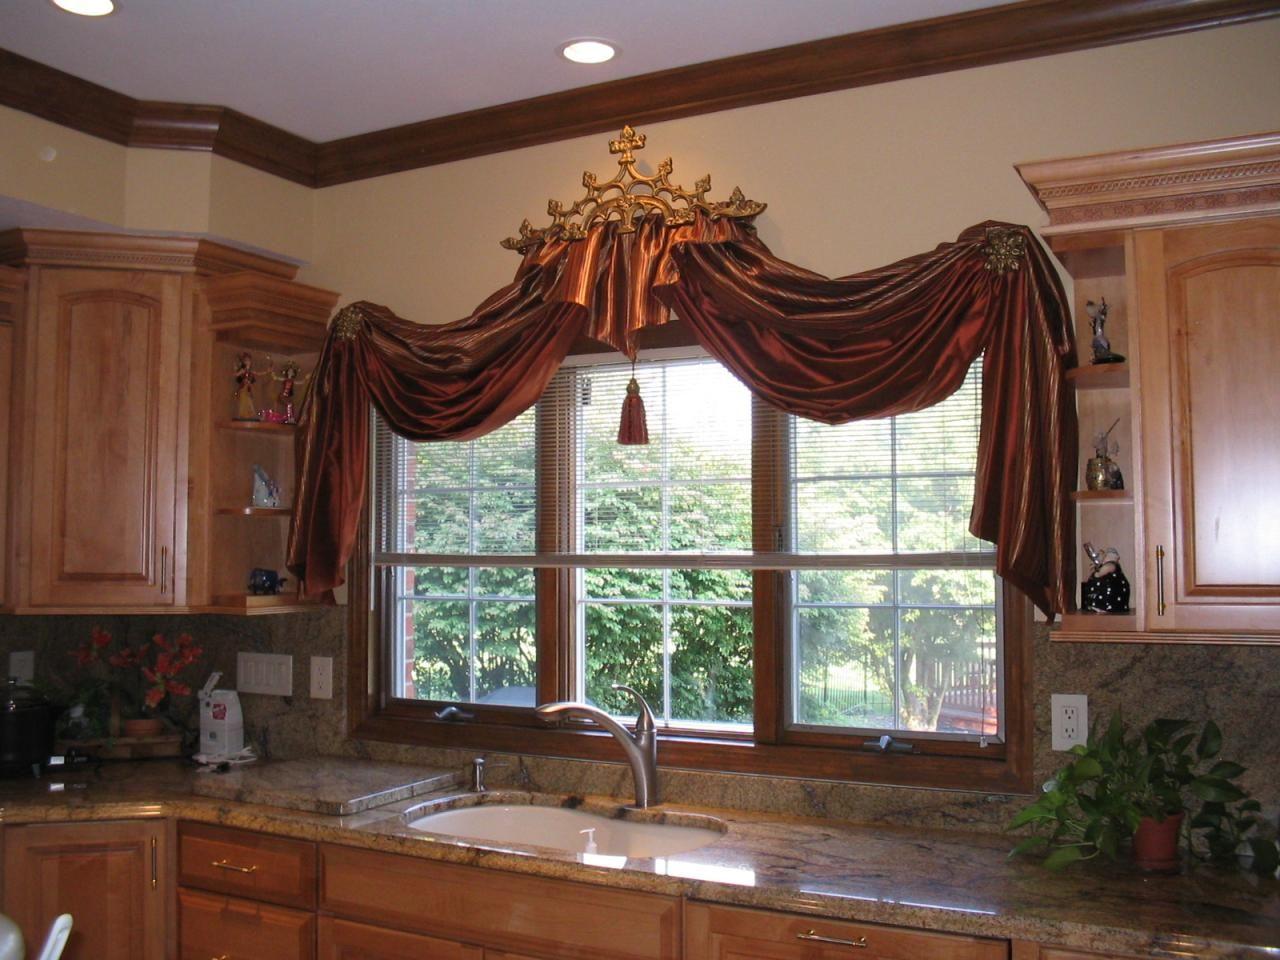 Window treatments over kitchen sink the window over the for Kitchen window treatments above sink